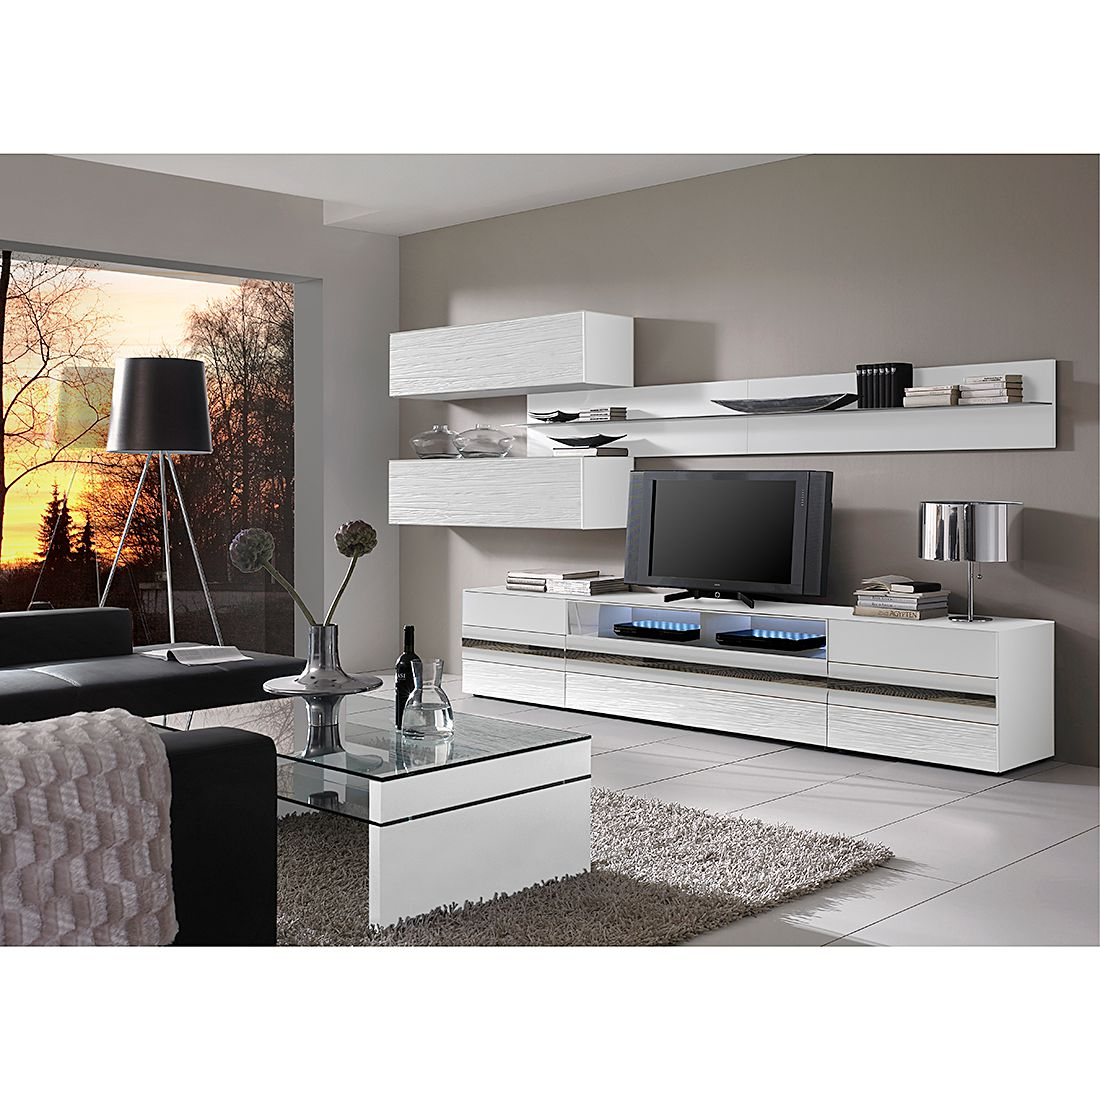 tv lowboard invito ohne beleuchtung havanna holtkamp jetzt kaufen. Black Bedroom Furniture Sets. Home Design Ideas